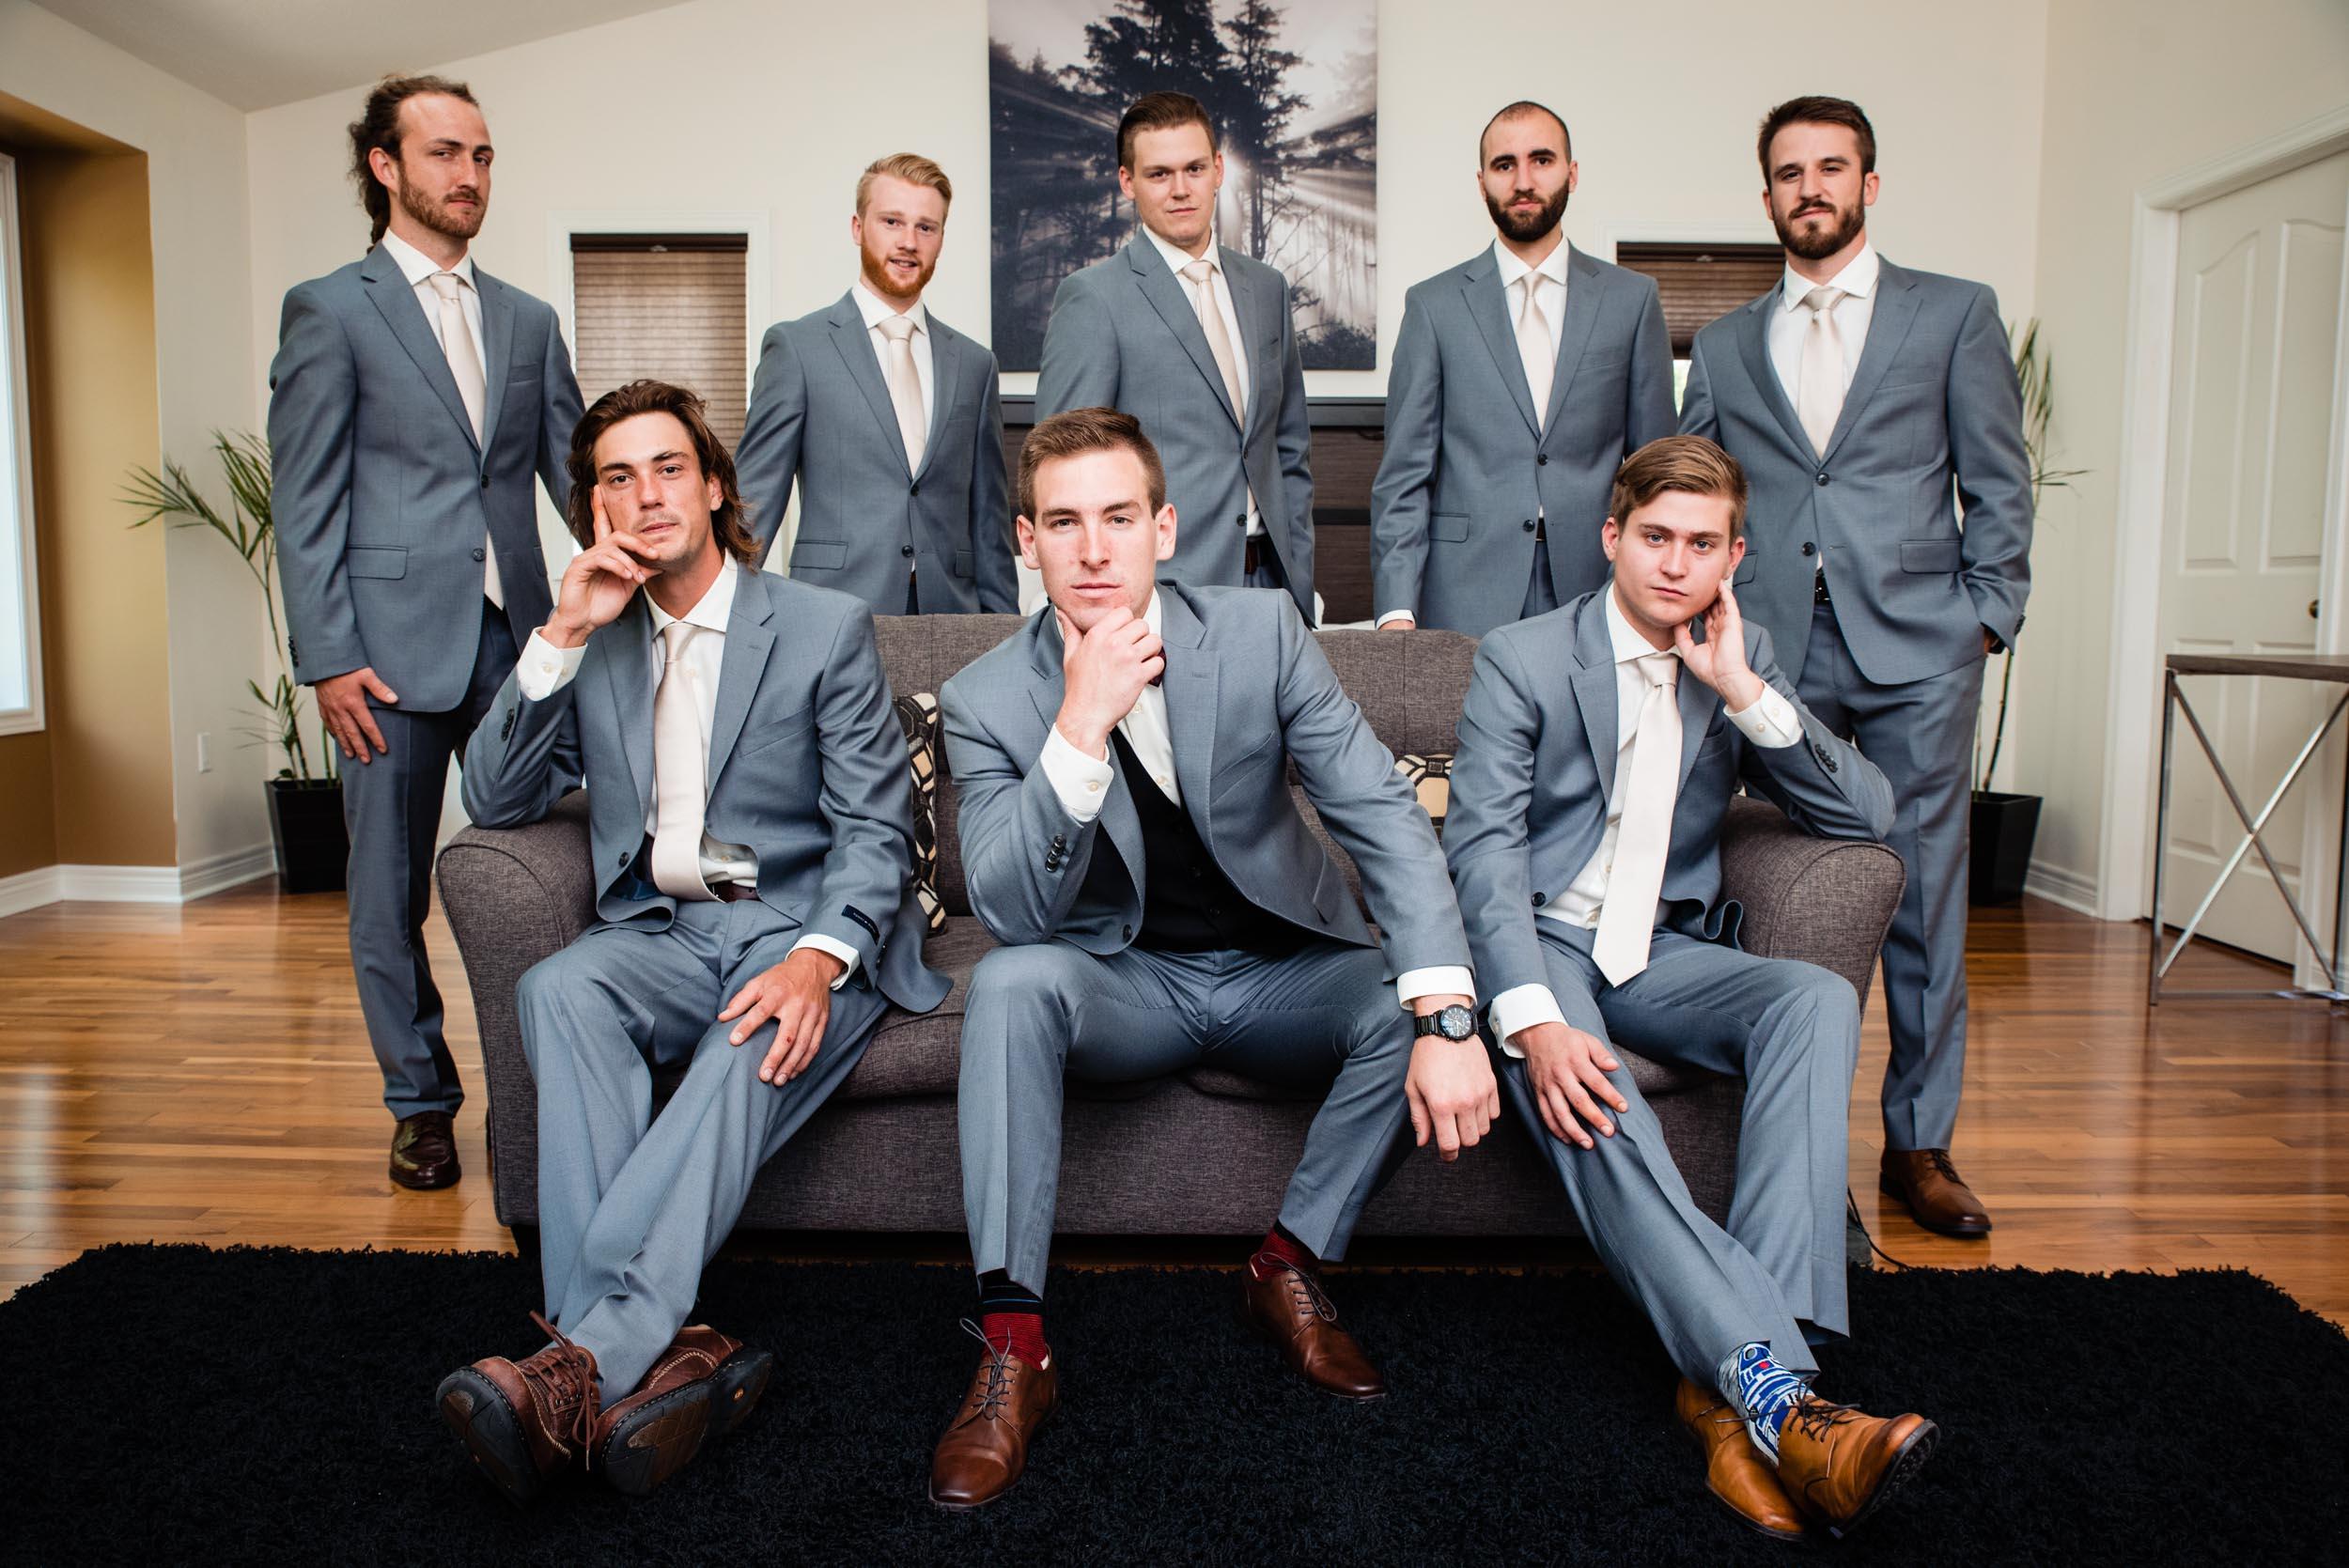 toronto-london-ontario-wedding-photographer-groomsmen-grey.jpg